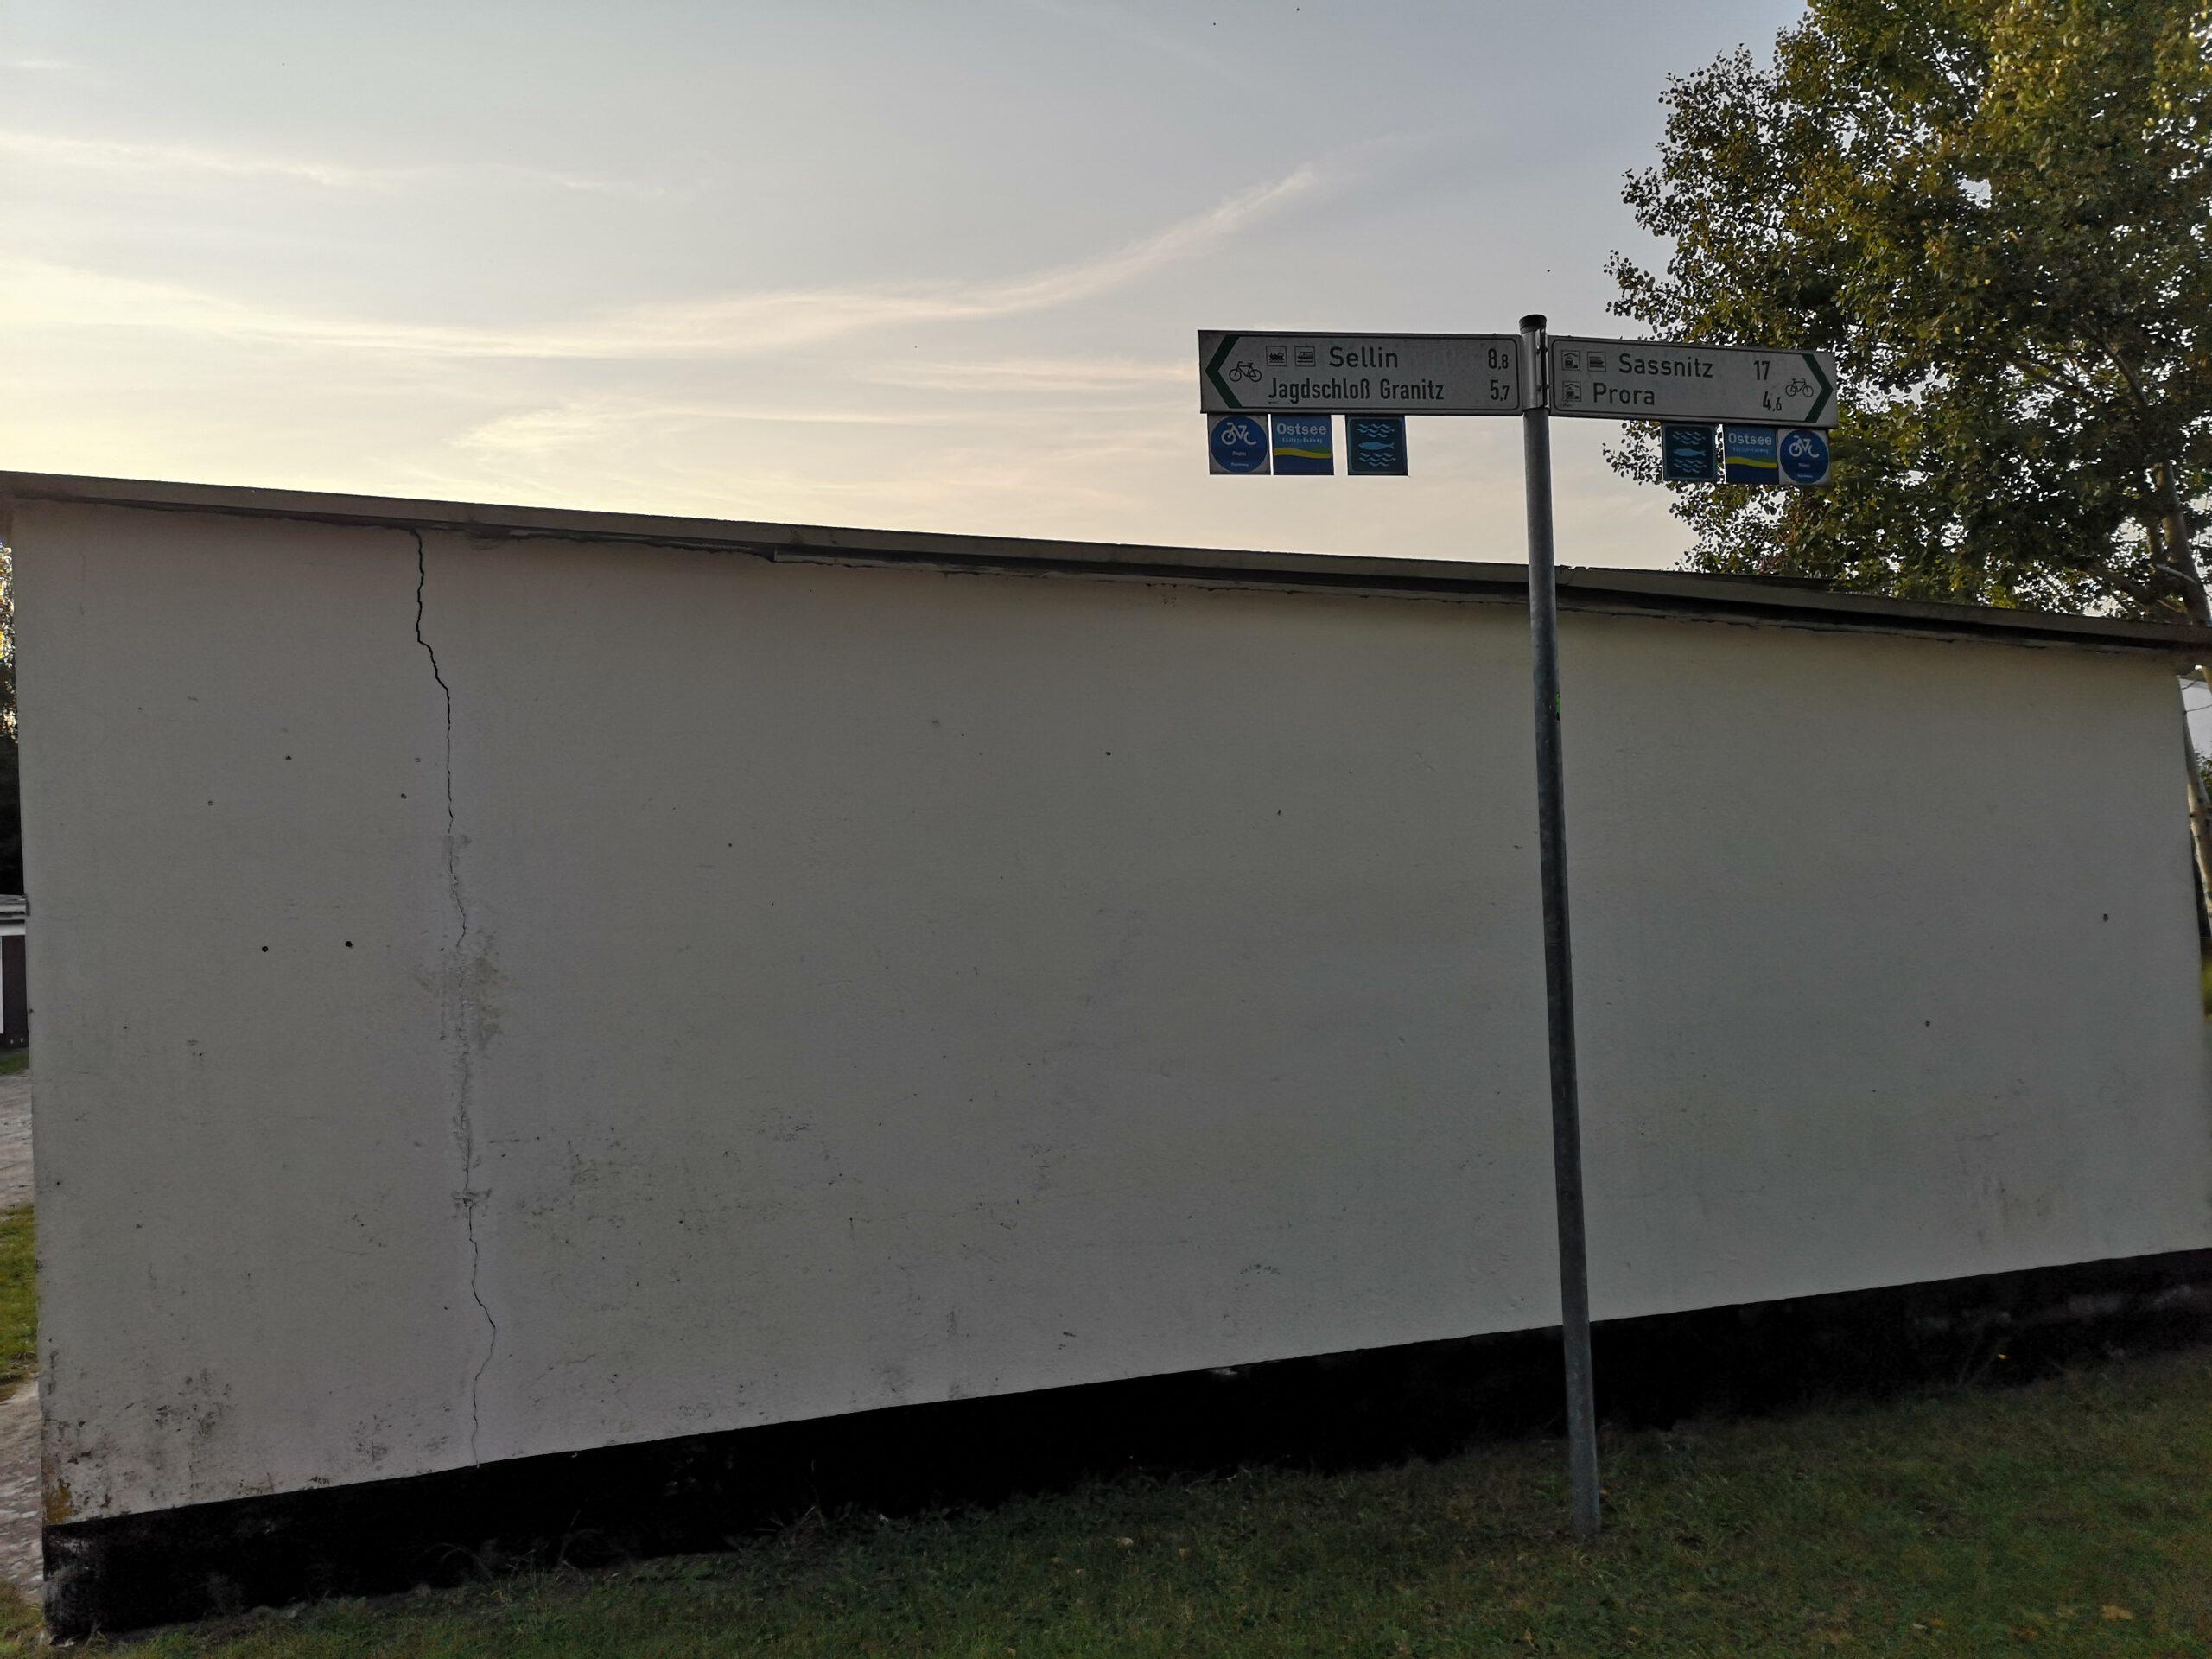 Sassnitz nach Moenchgut Ruegen Rundweg